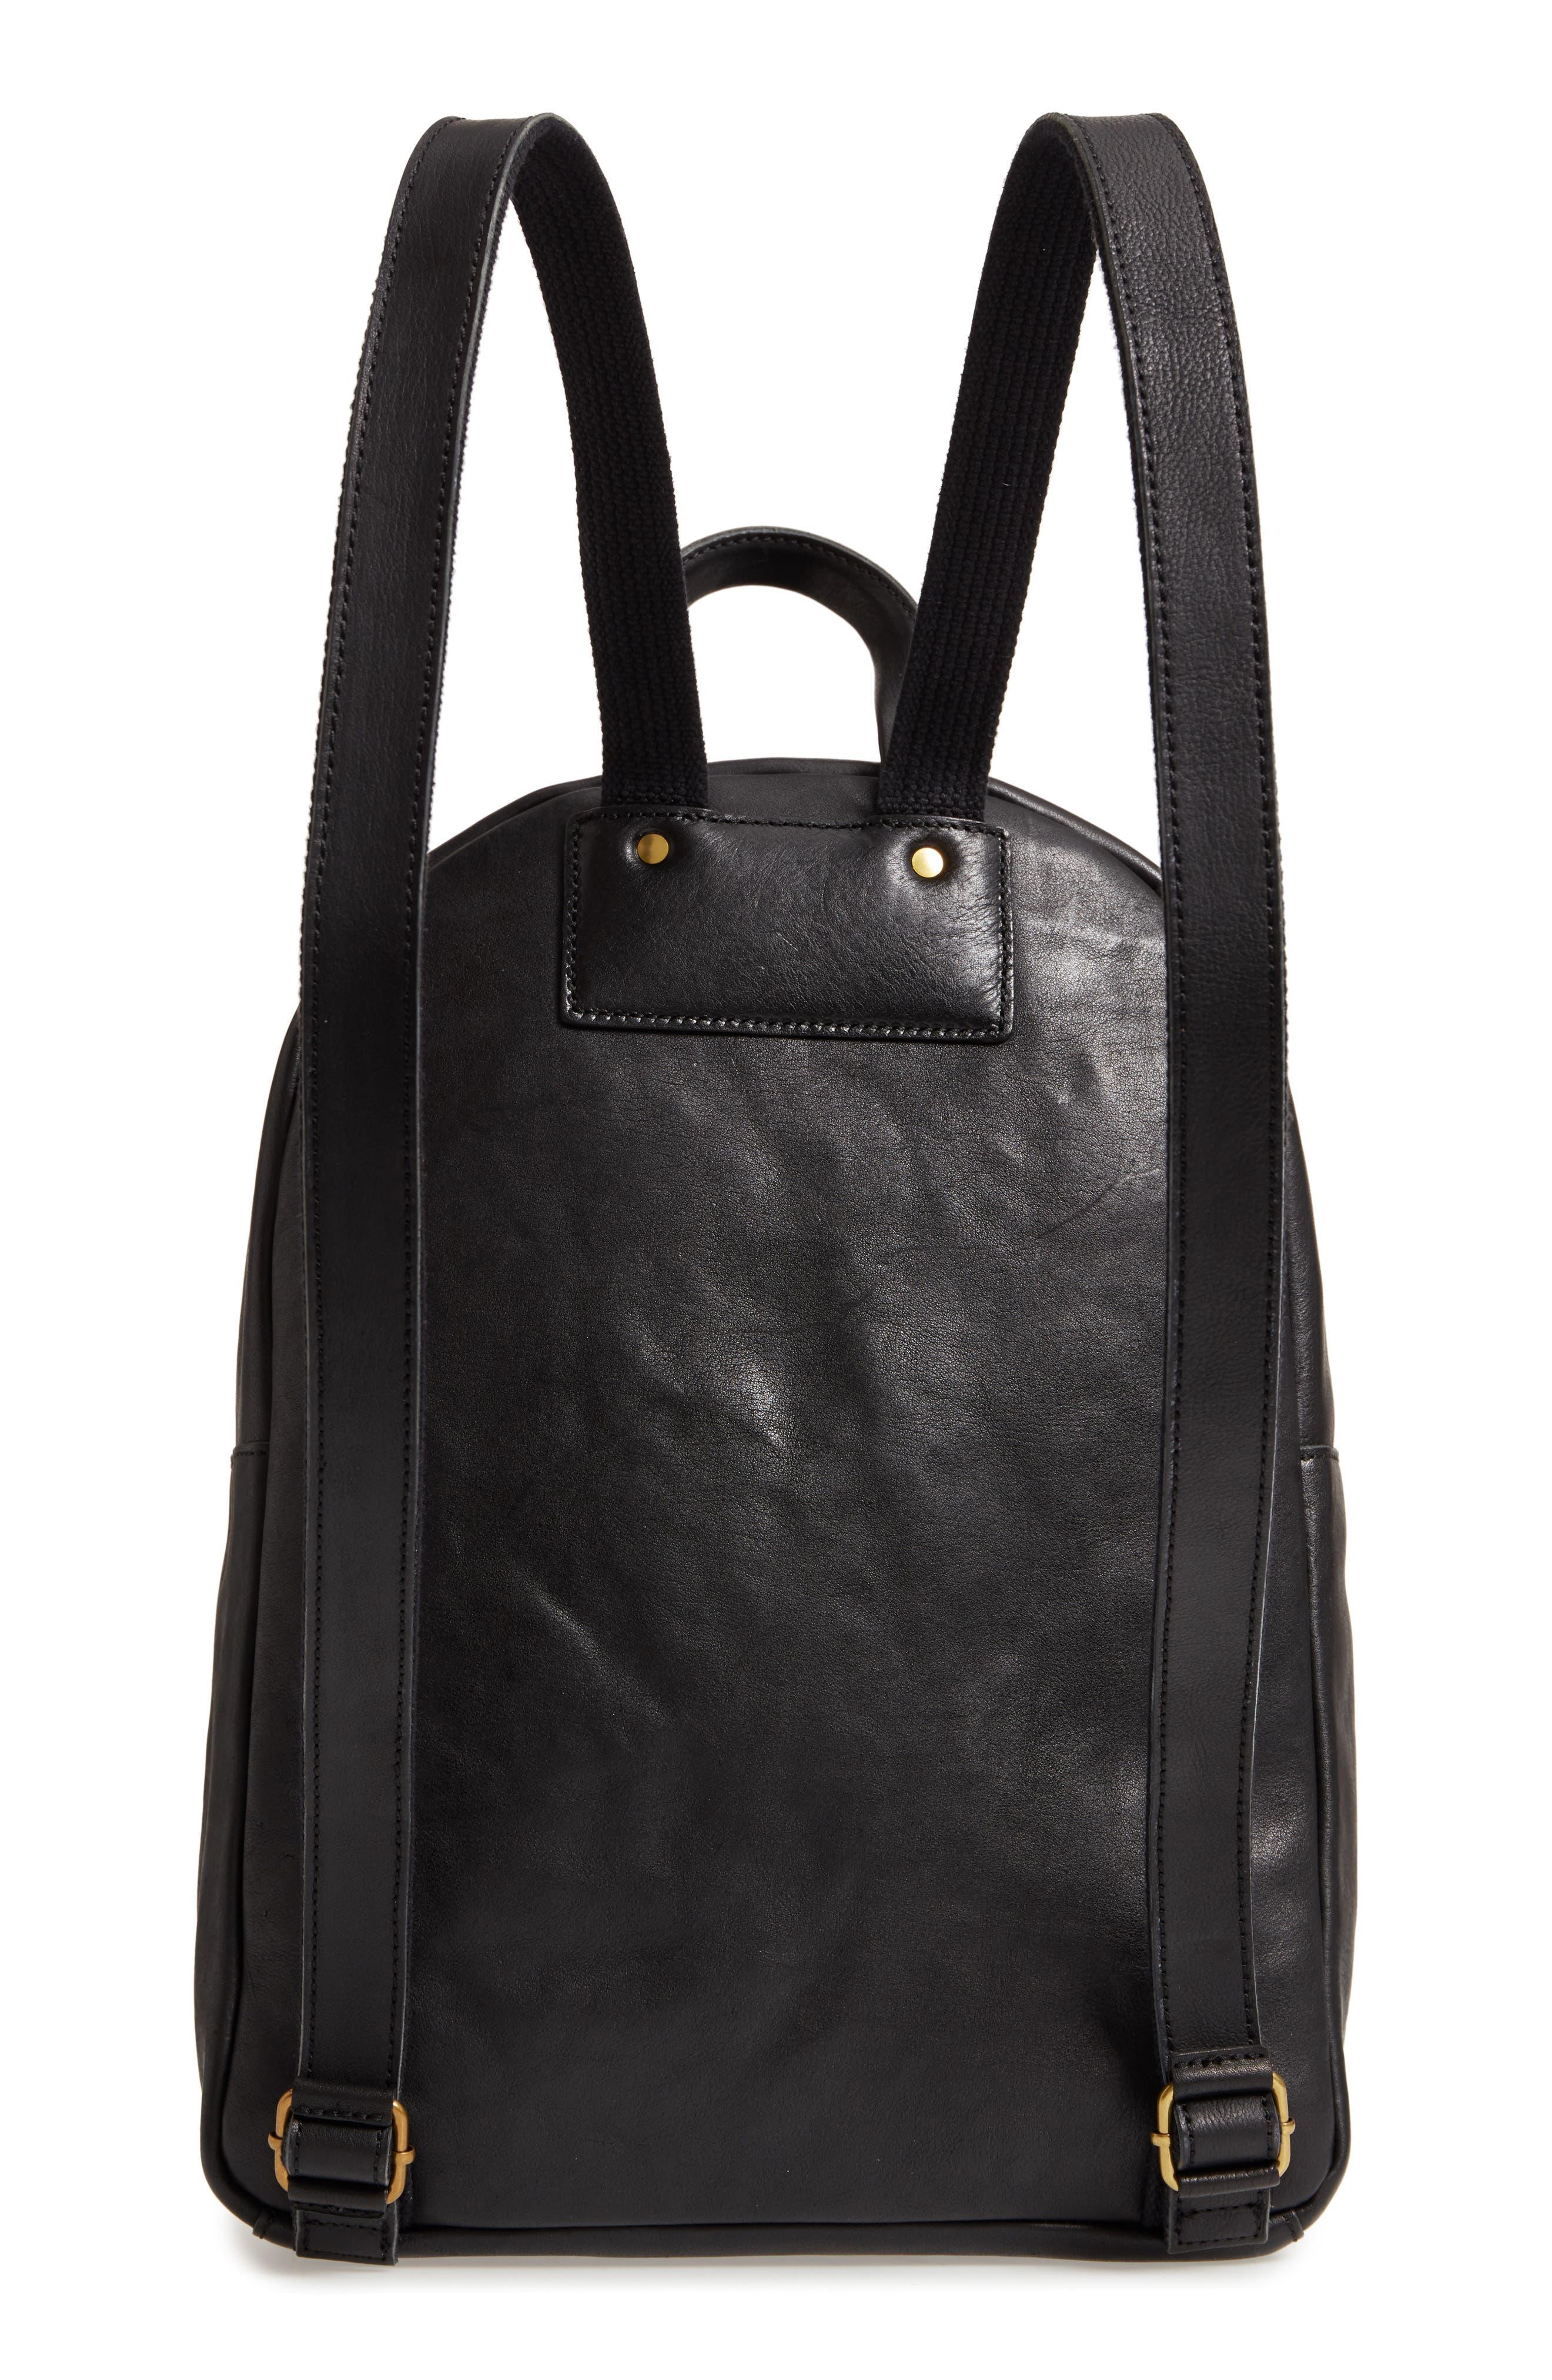 MADEWELL, Lorimer Leather Backpack, Alternate thumbnail 4, color, TRUE BLACK